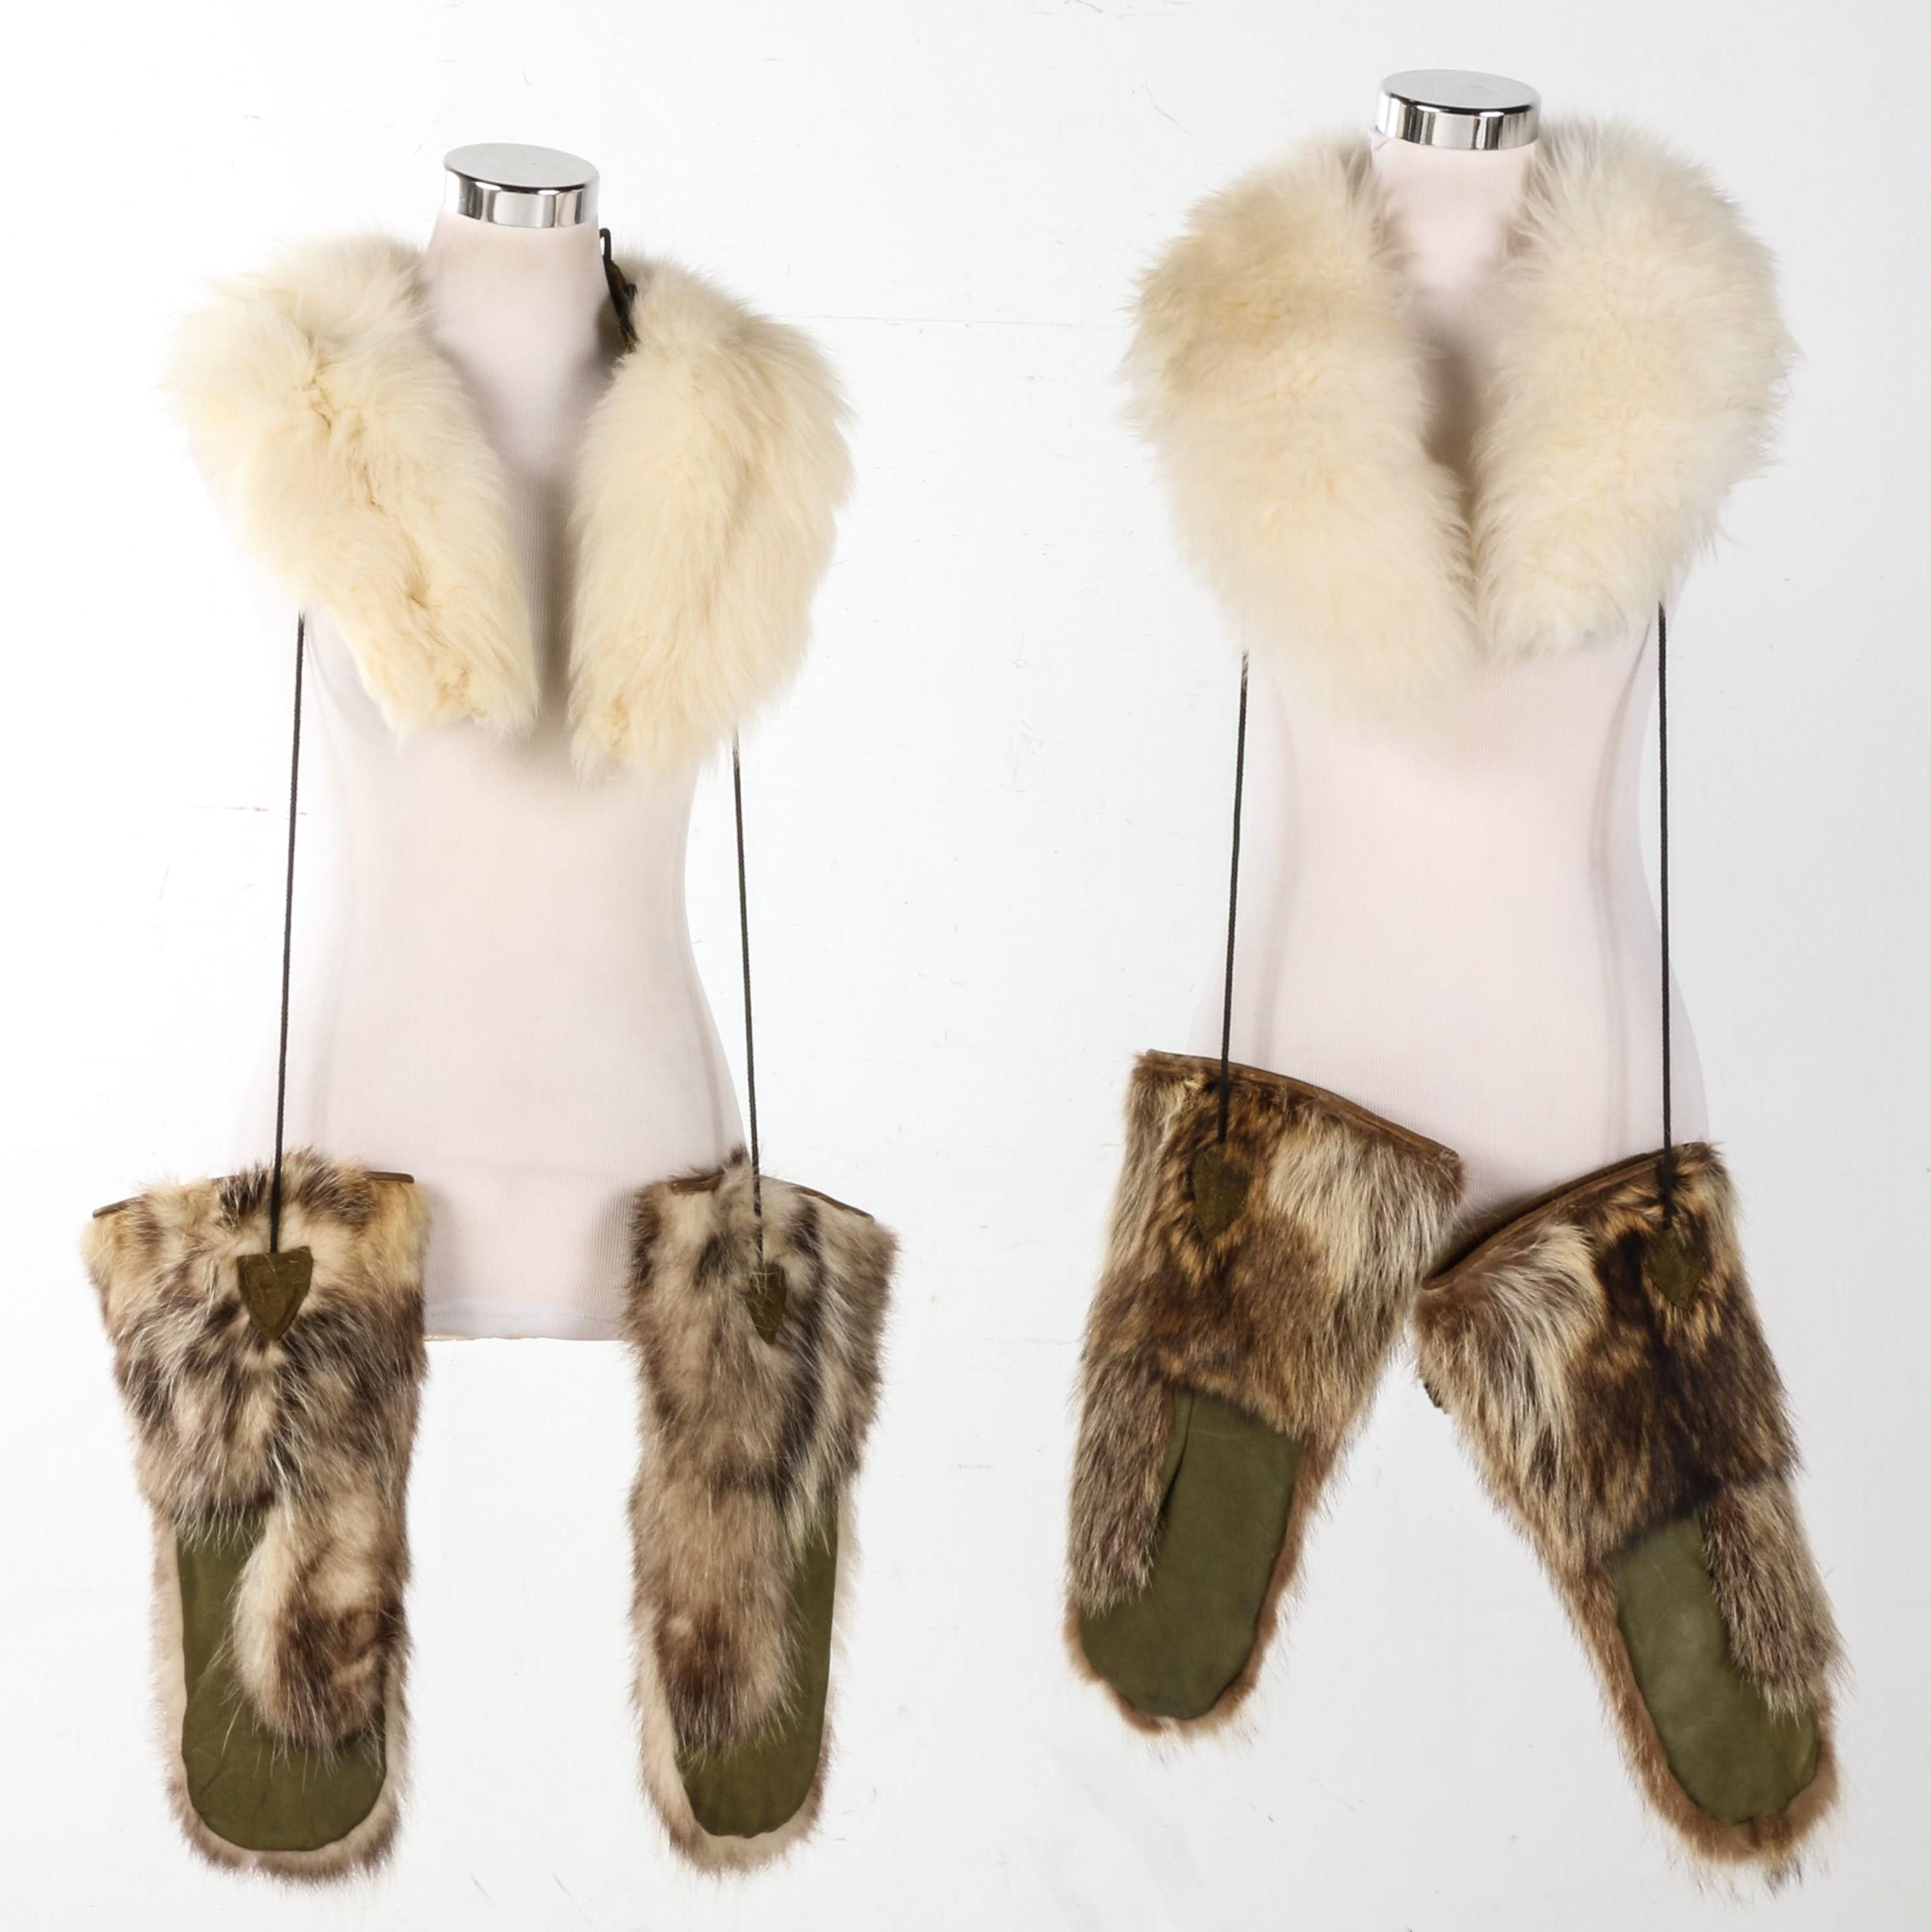 Lamb Fur Collars and Two Pairs of Badger Fur Mittens